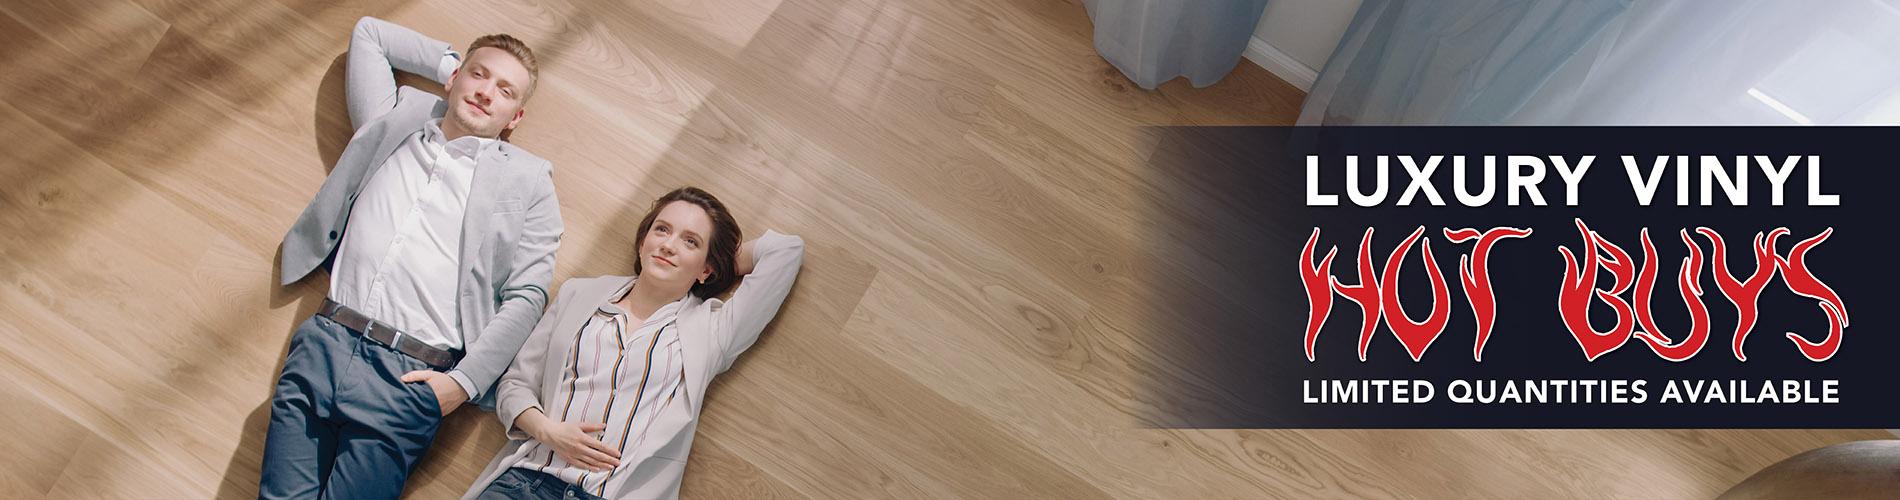 Luxury Vinyl Plank Flooring Sale at Abbey Carpet of Tacoma, WA